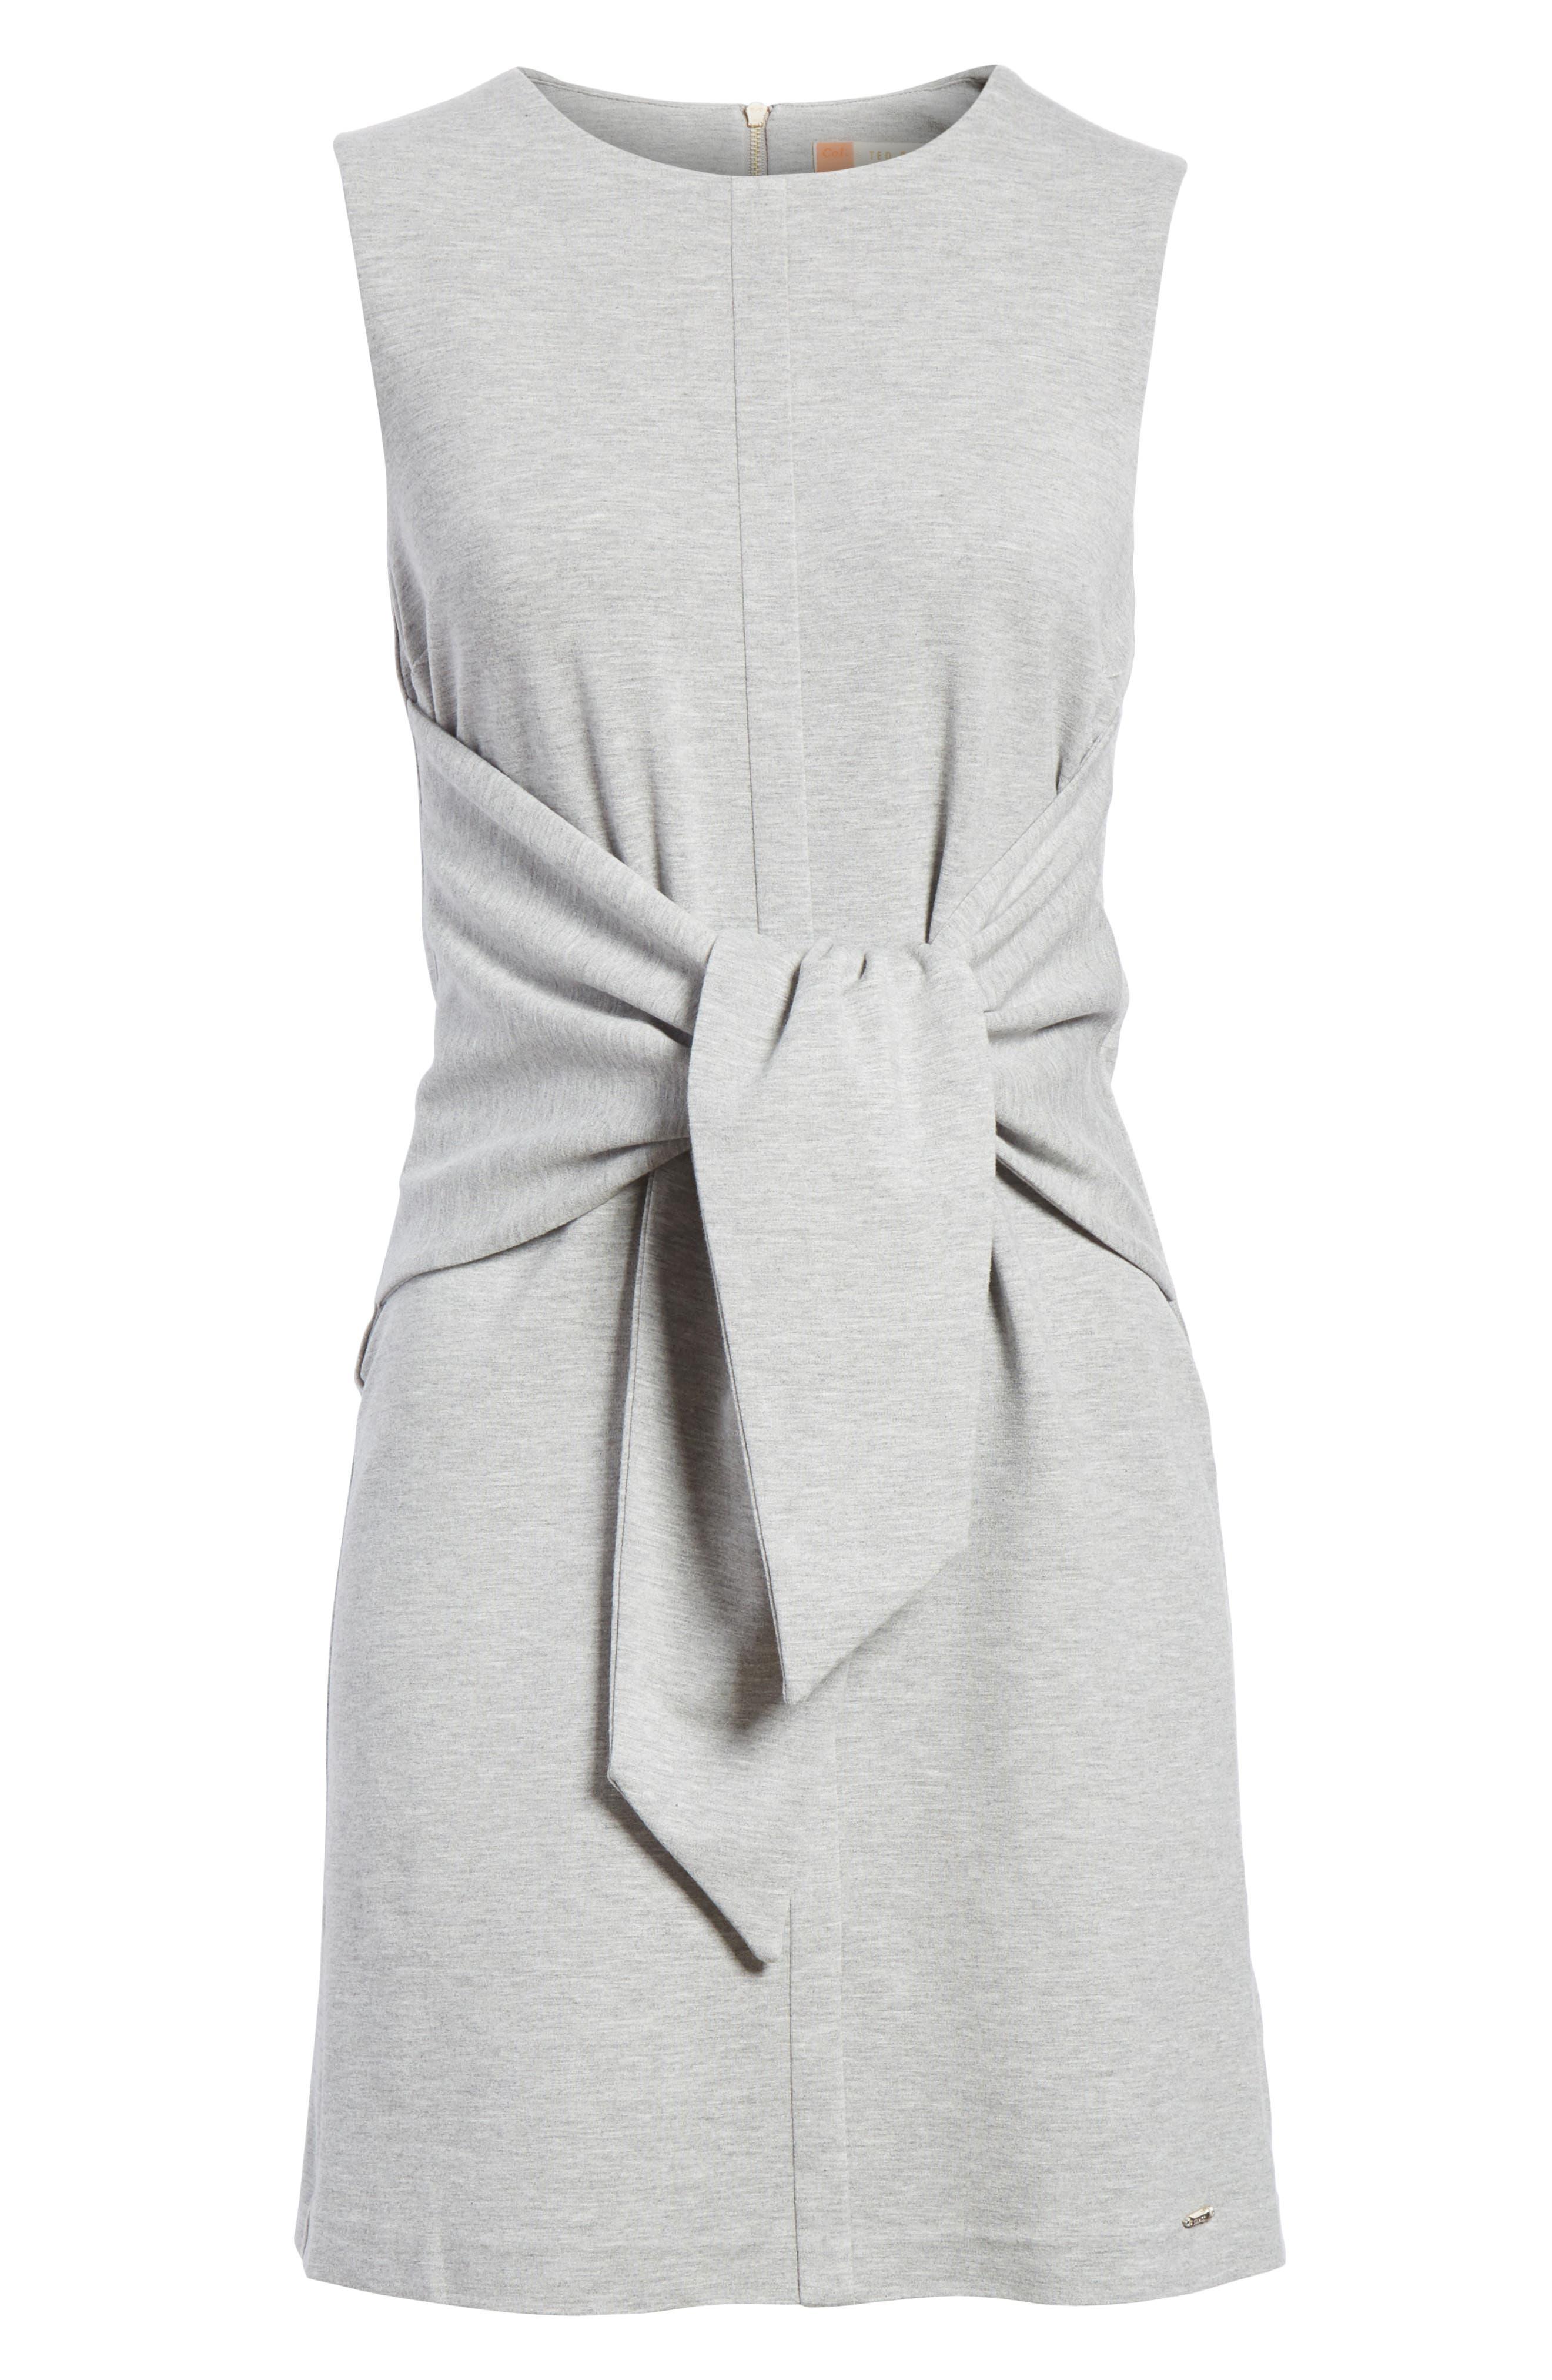 Evalina Tie Front Dress,                             Alternate thumbnail 6, color,                             Grey Marl